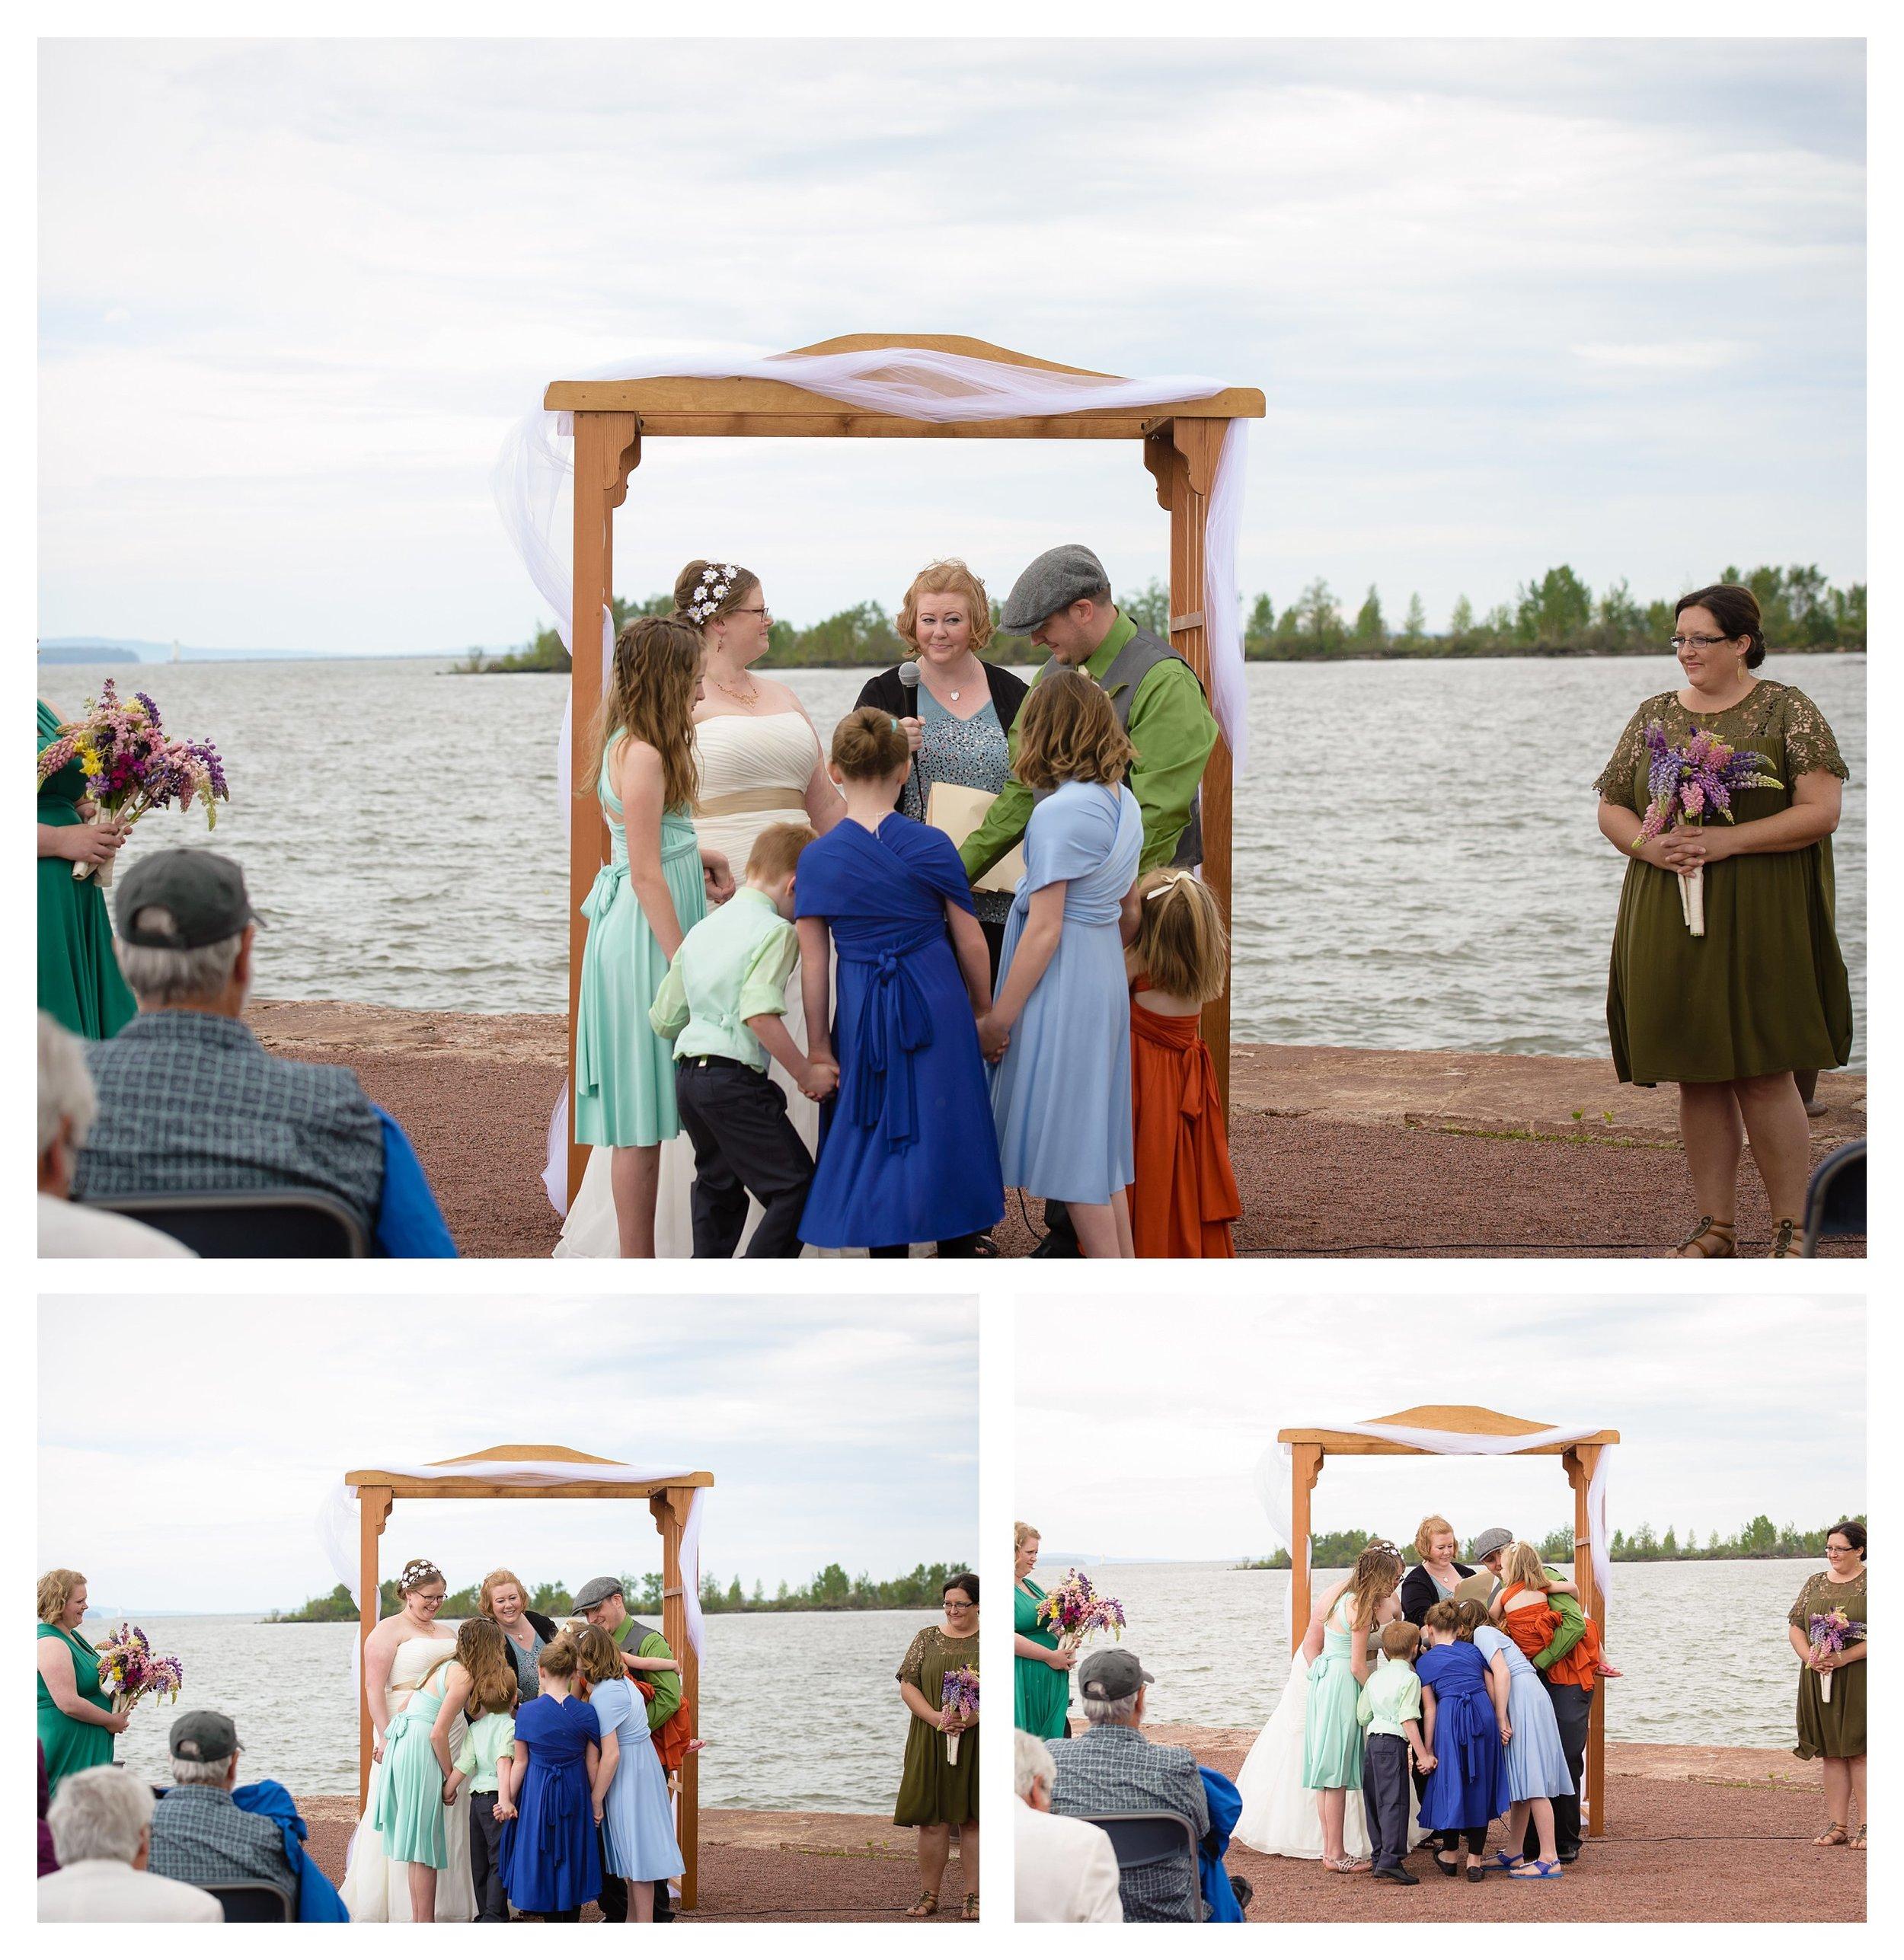 ashland oredock northwoods wisconsin wedding ps 139 photography_0286.jpg